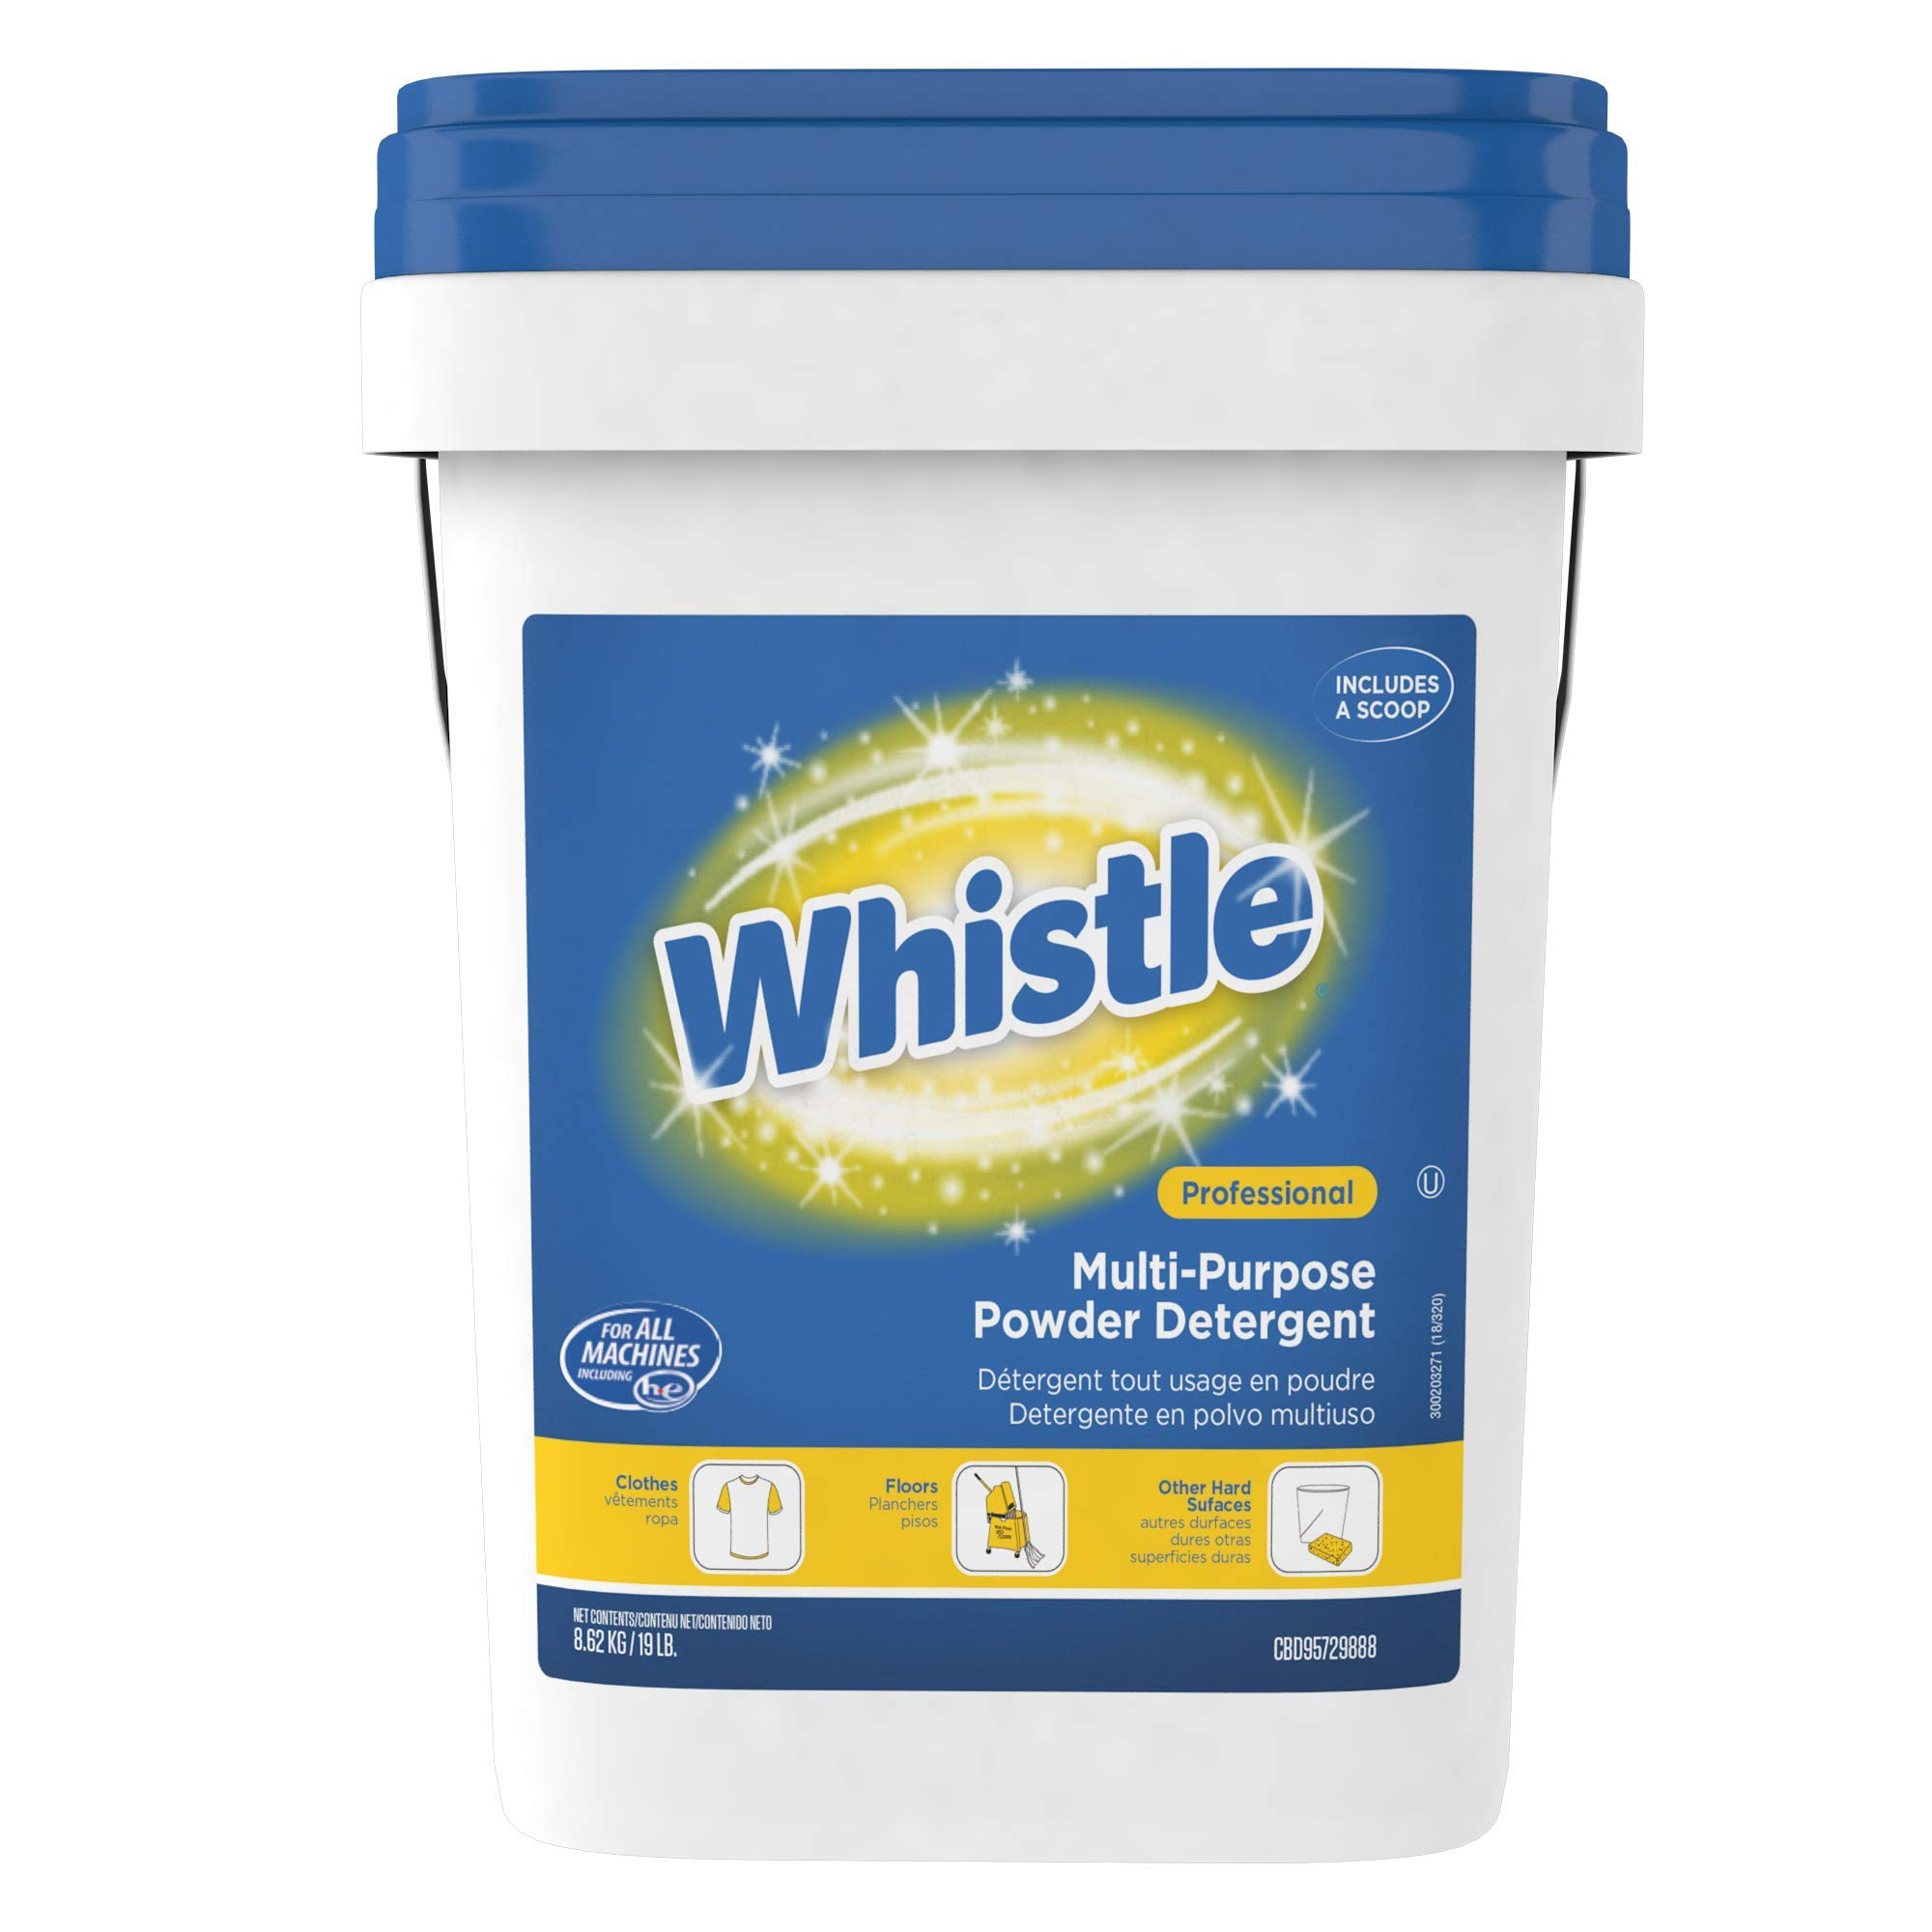 Diversey Whistle Multi-Purpose Powder Detergent, 19 lb Pail